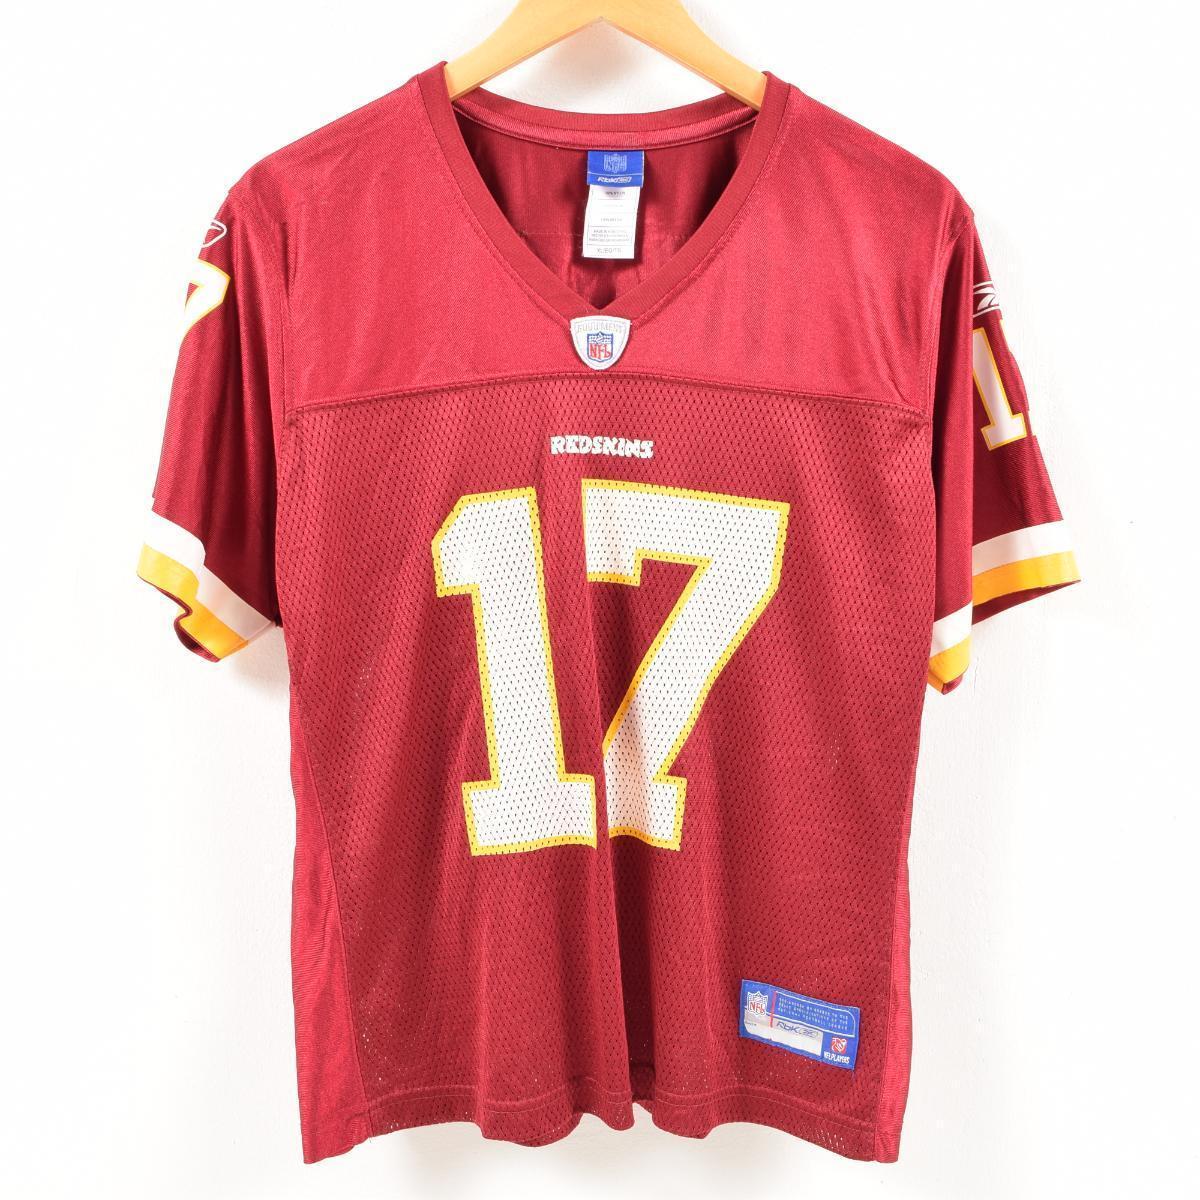 new style 5c074 ff0ab Reebok Reebok NFL WASHINGTON REDSKINS Washington Redskins mesh game shirt  replica uniform men XS /was7100